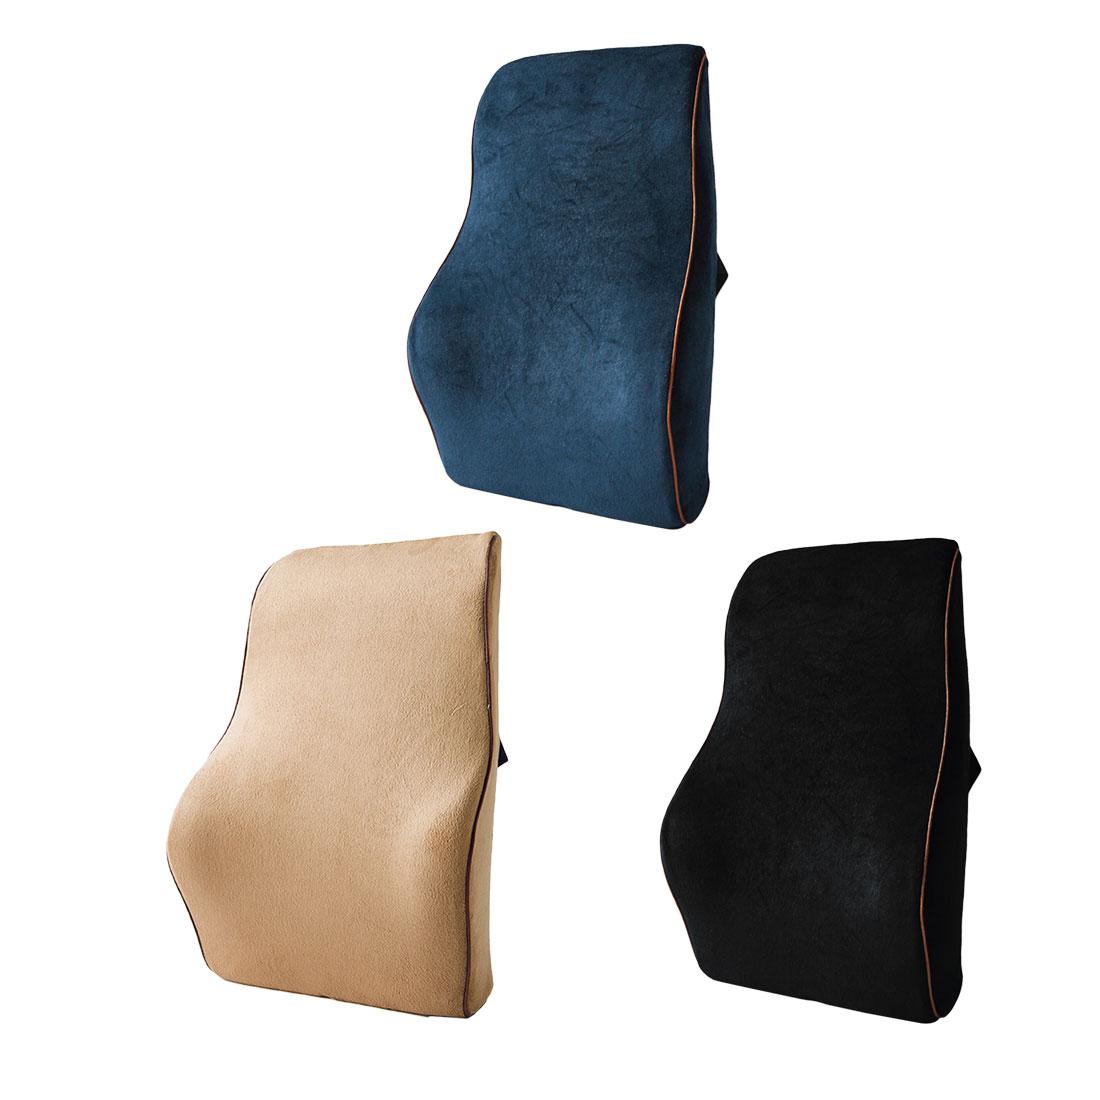 Office Chair Back Support Cushion Reviews Swivel And Sofa Aliexpress Buy Dewtreetali New Car Memory Foam